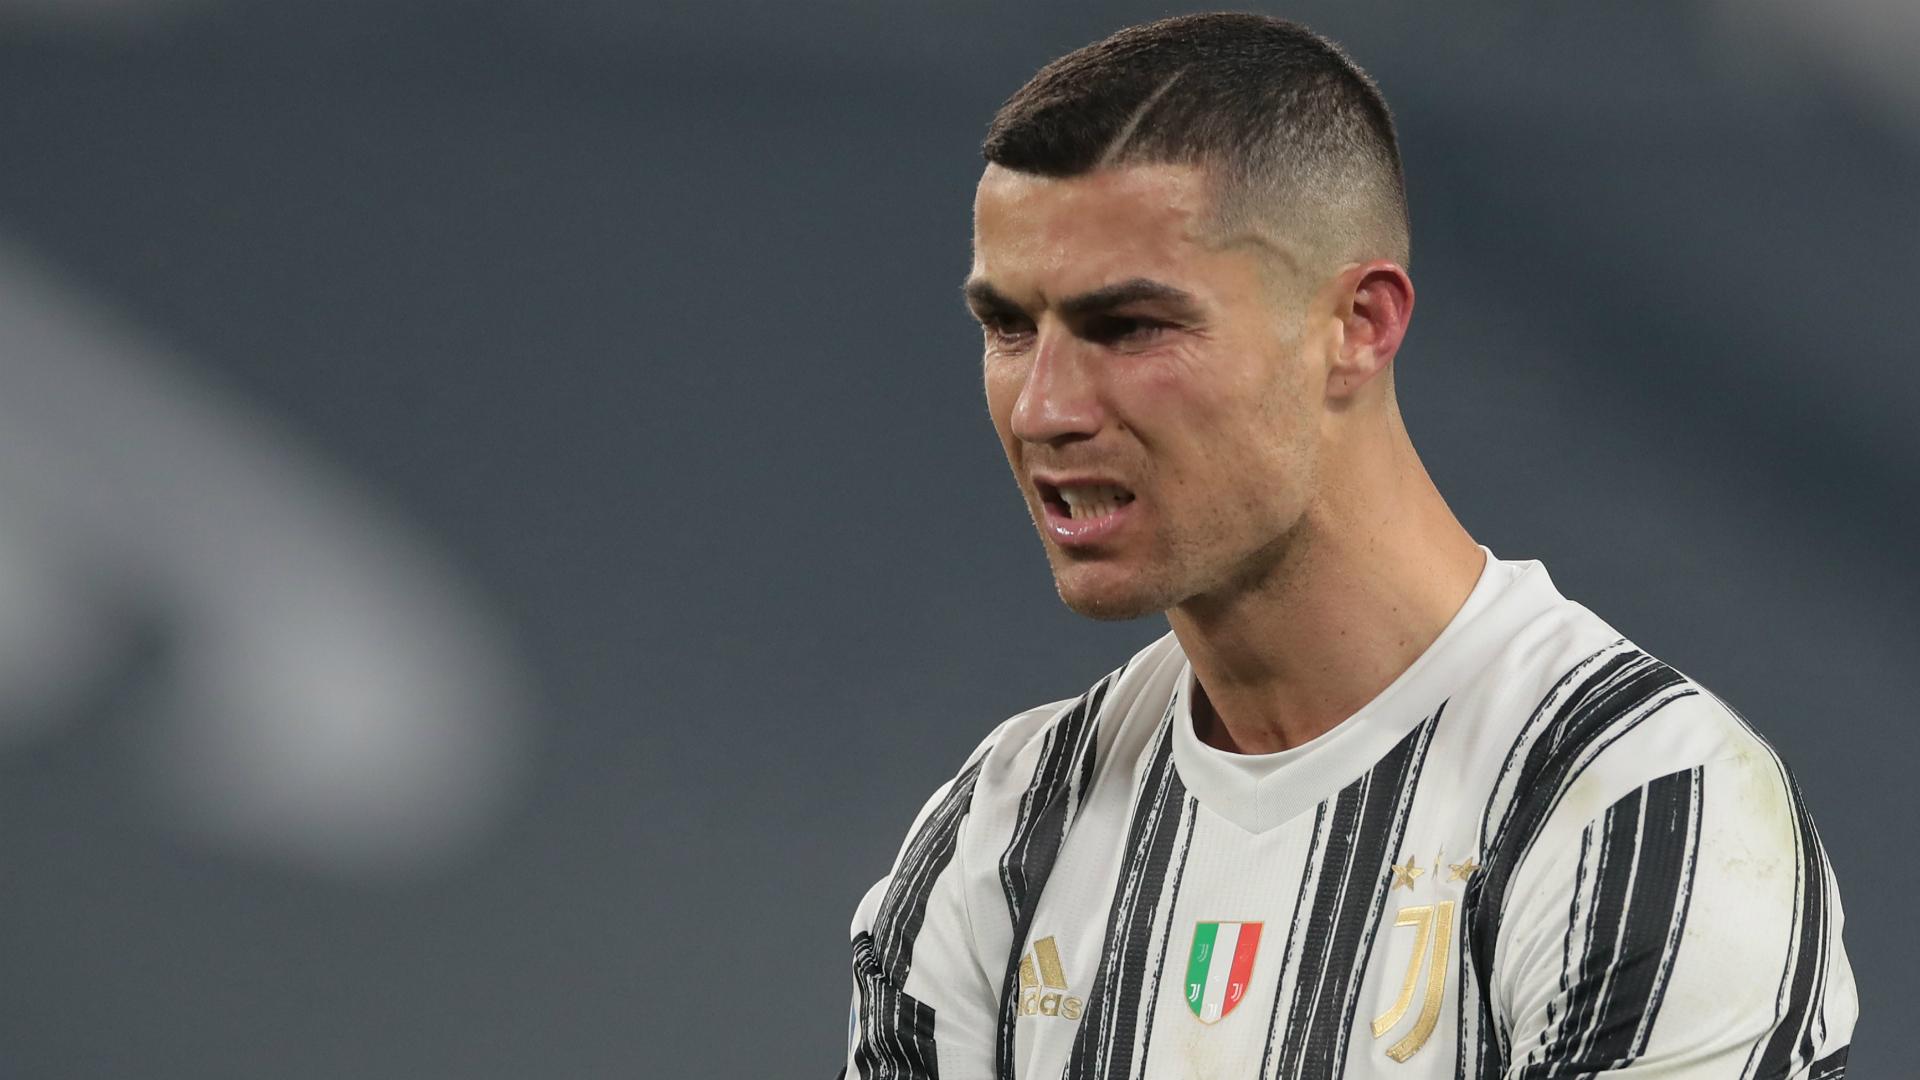 Juventus 0-3 Fiorentina: Ten-man champions humbled at home as unbeaten start ends